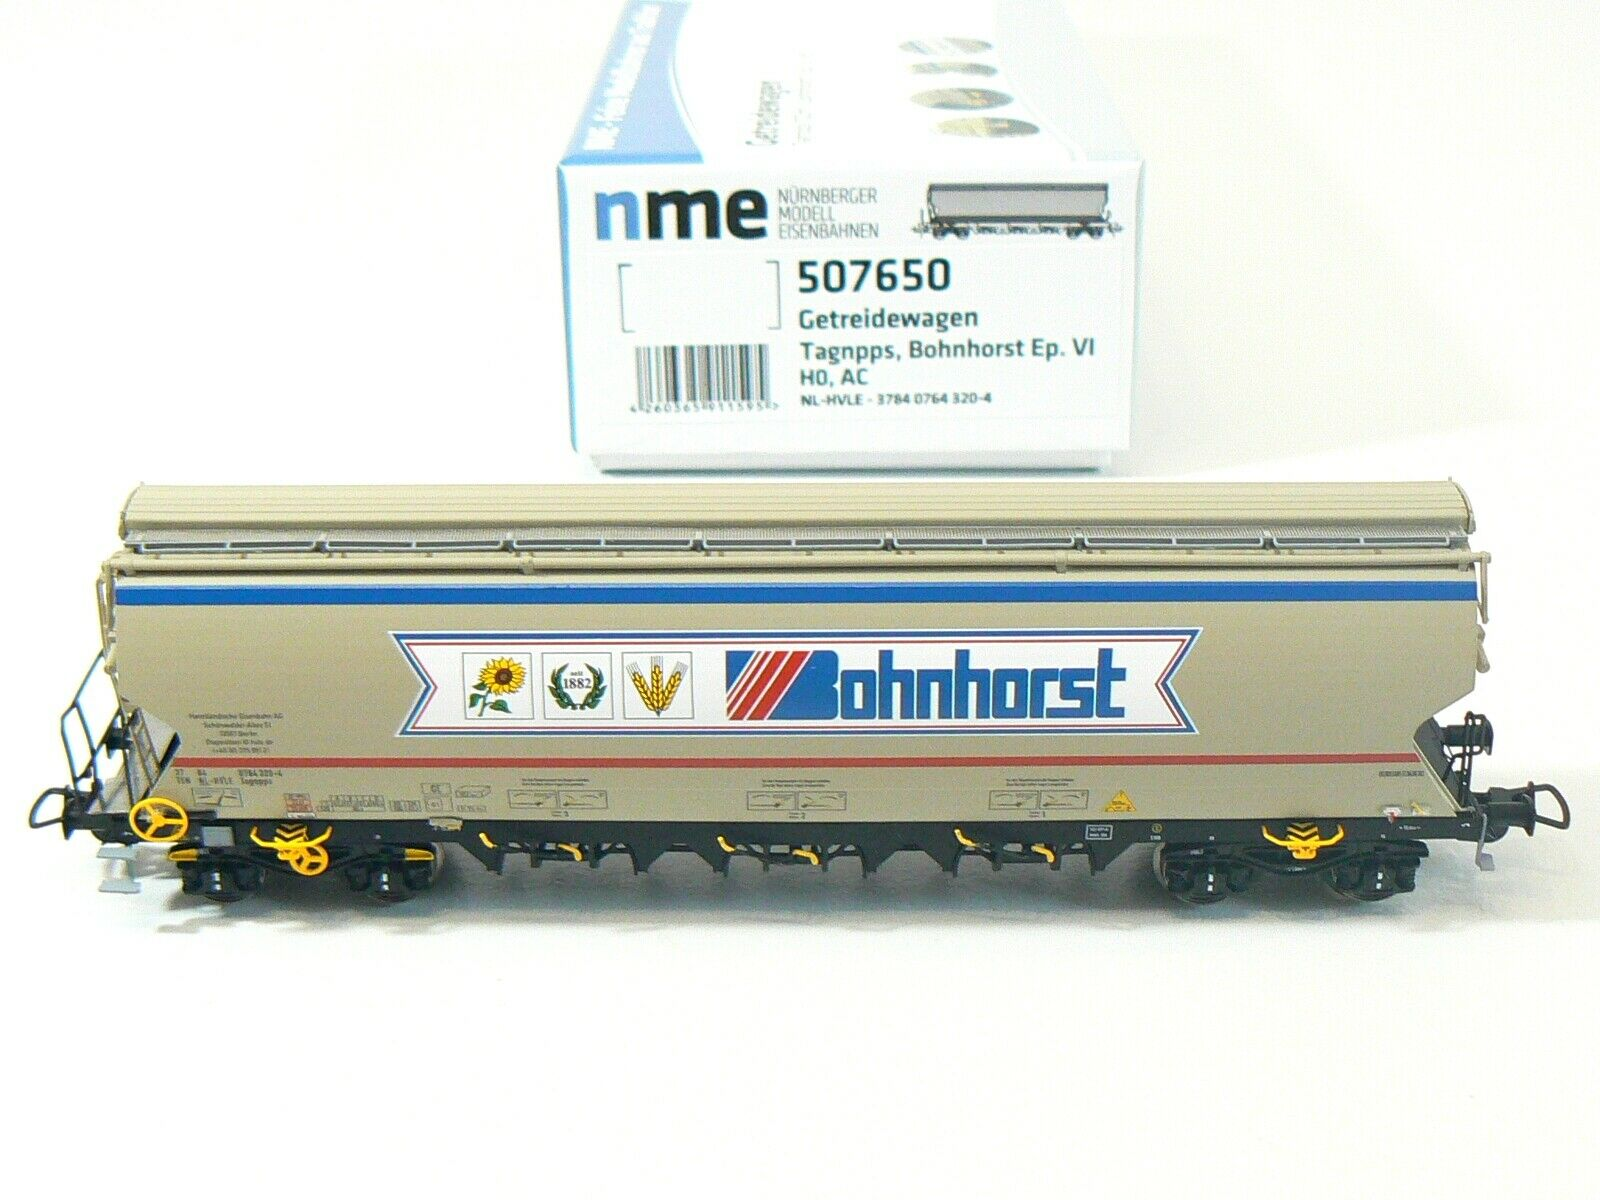 NME H0 507650, AC, Getreidewagen Tagnpps, Bohnhorst, grau, neu, OVP